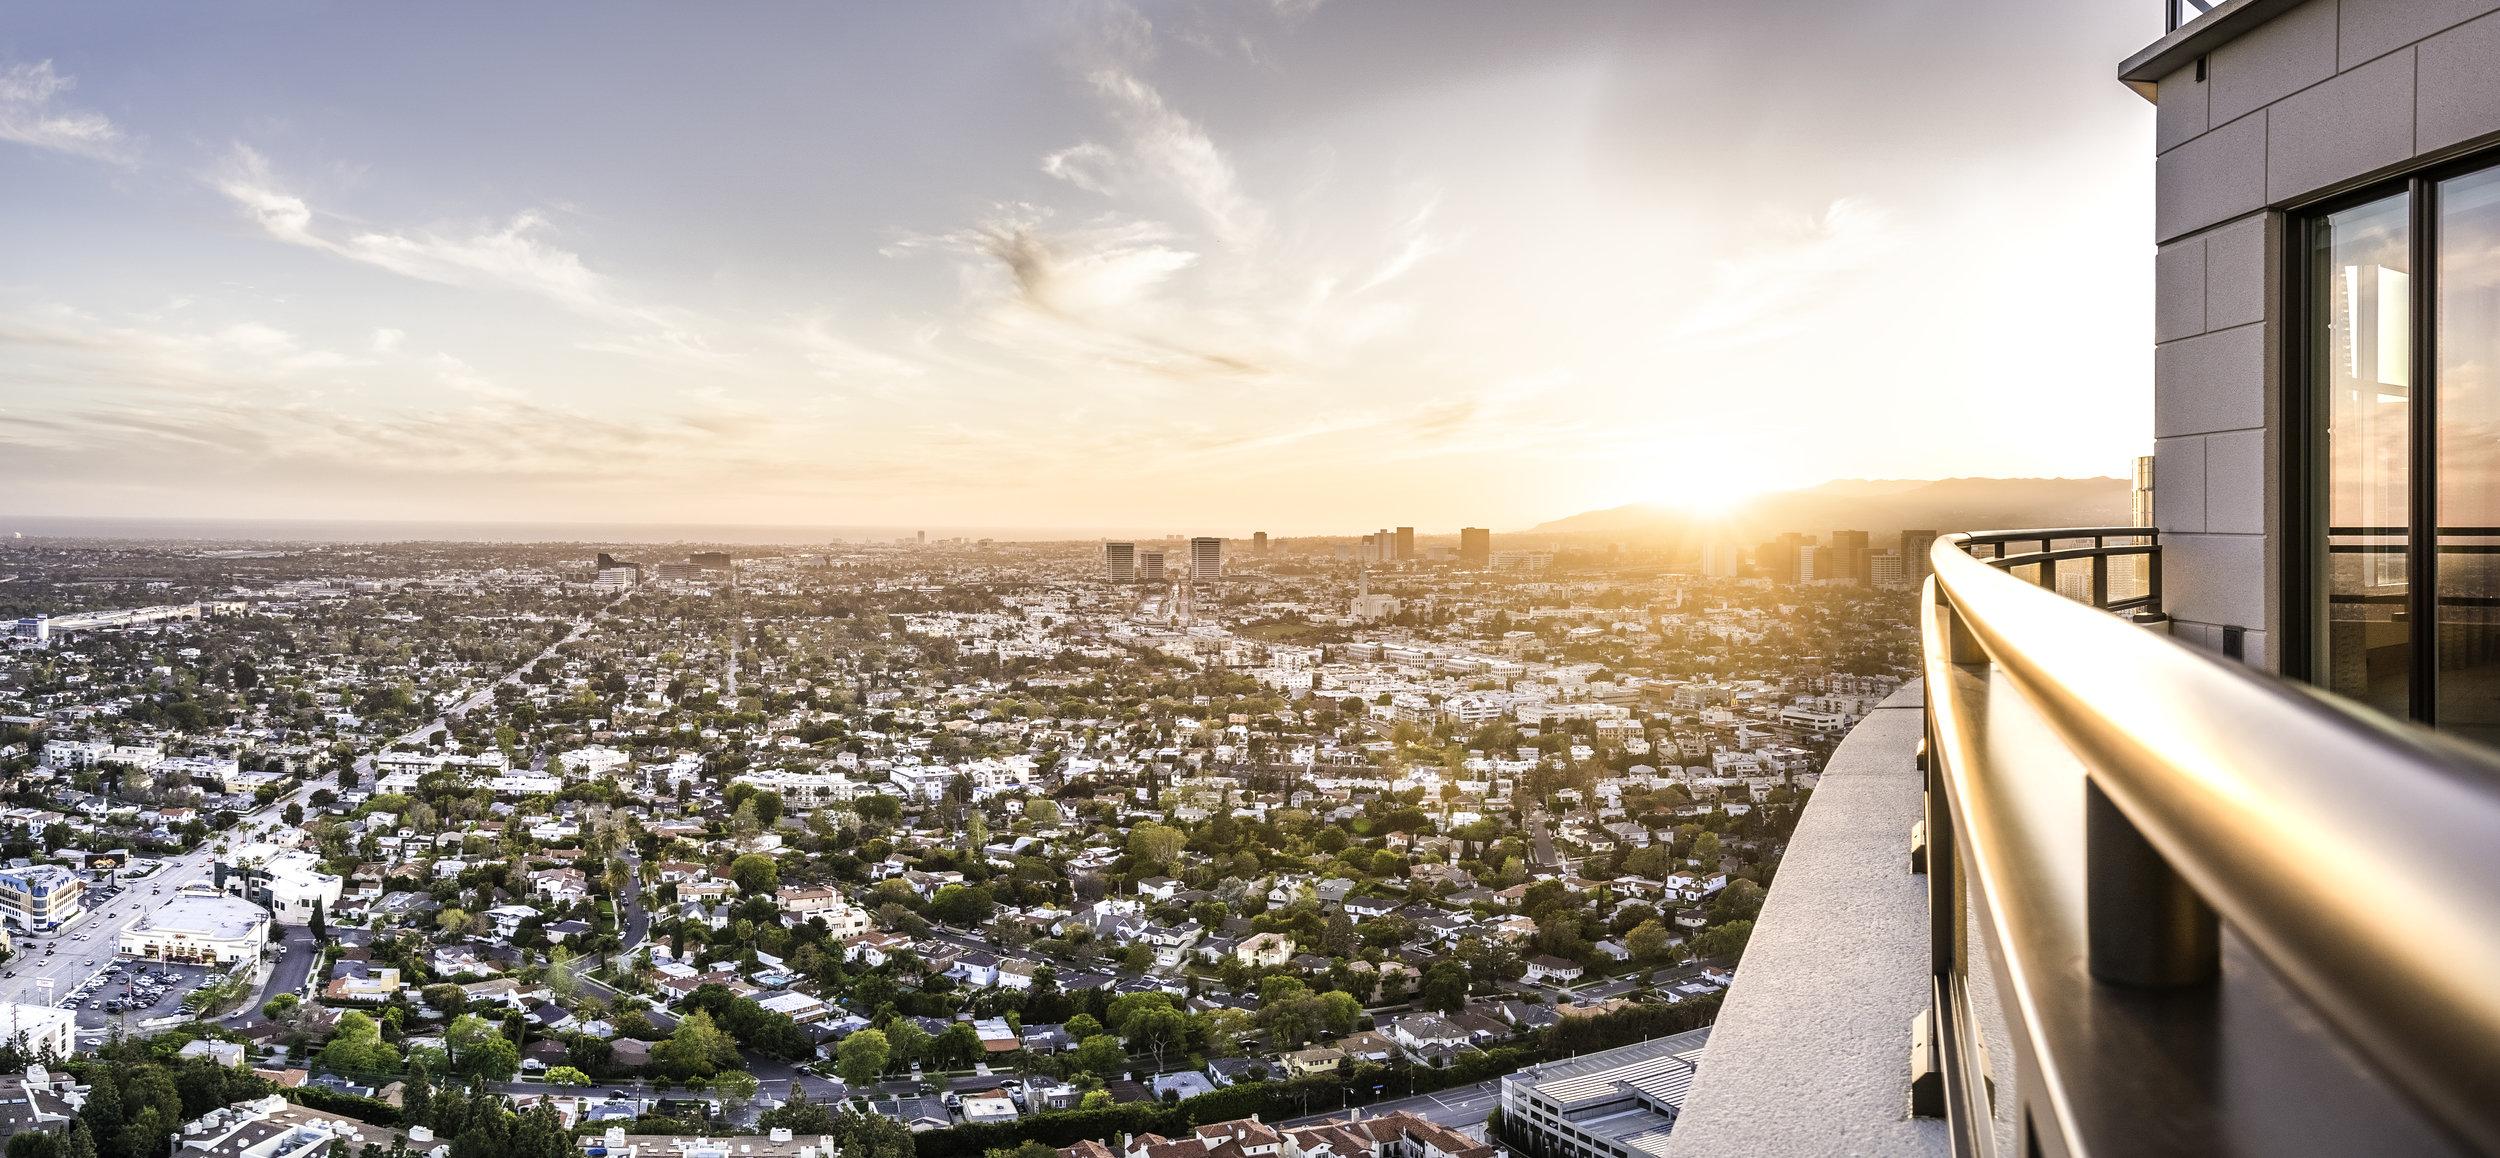 W Century Dr - Los Angeles